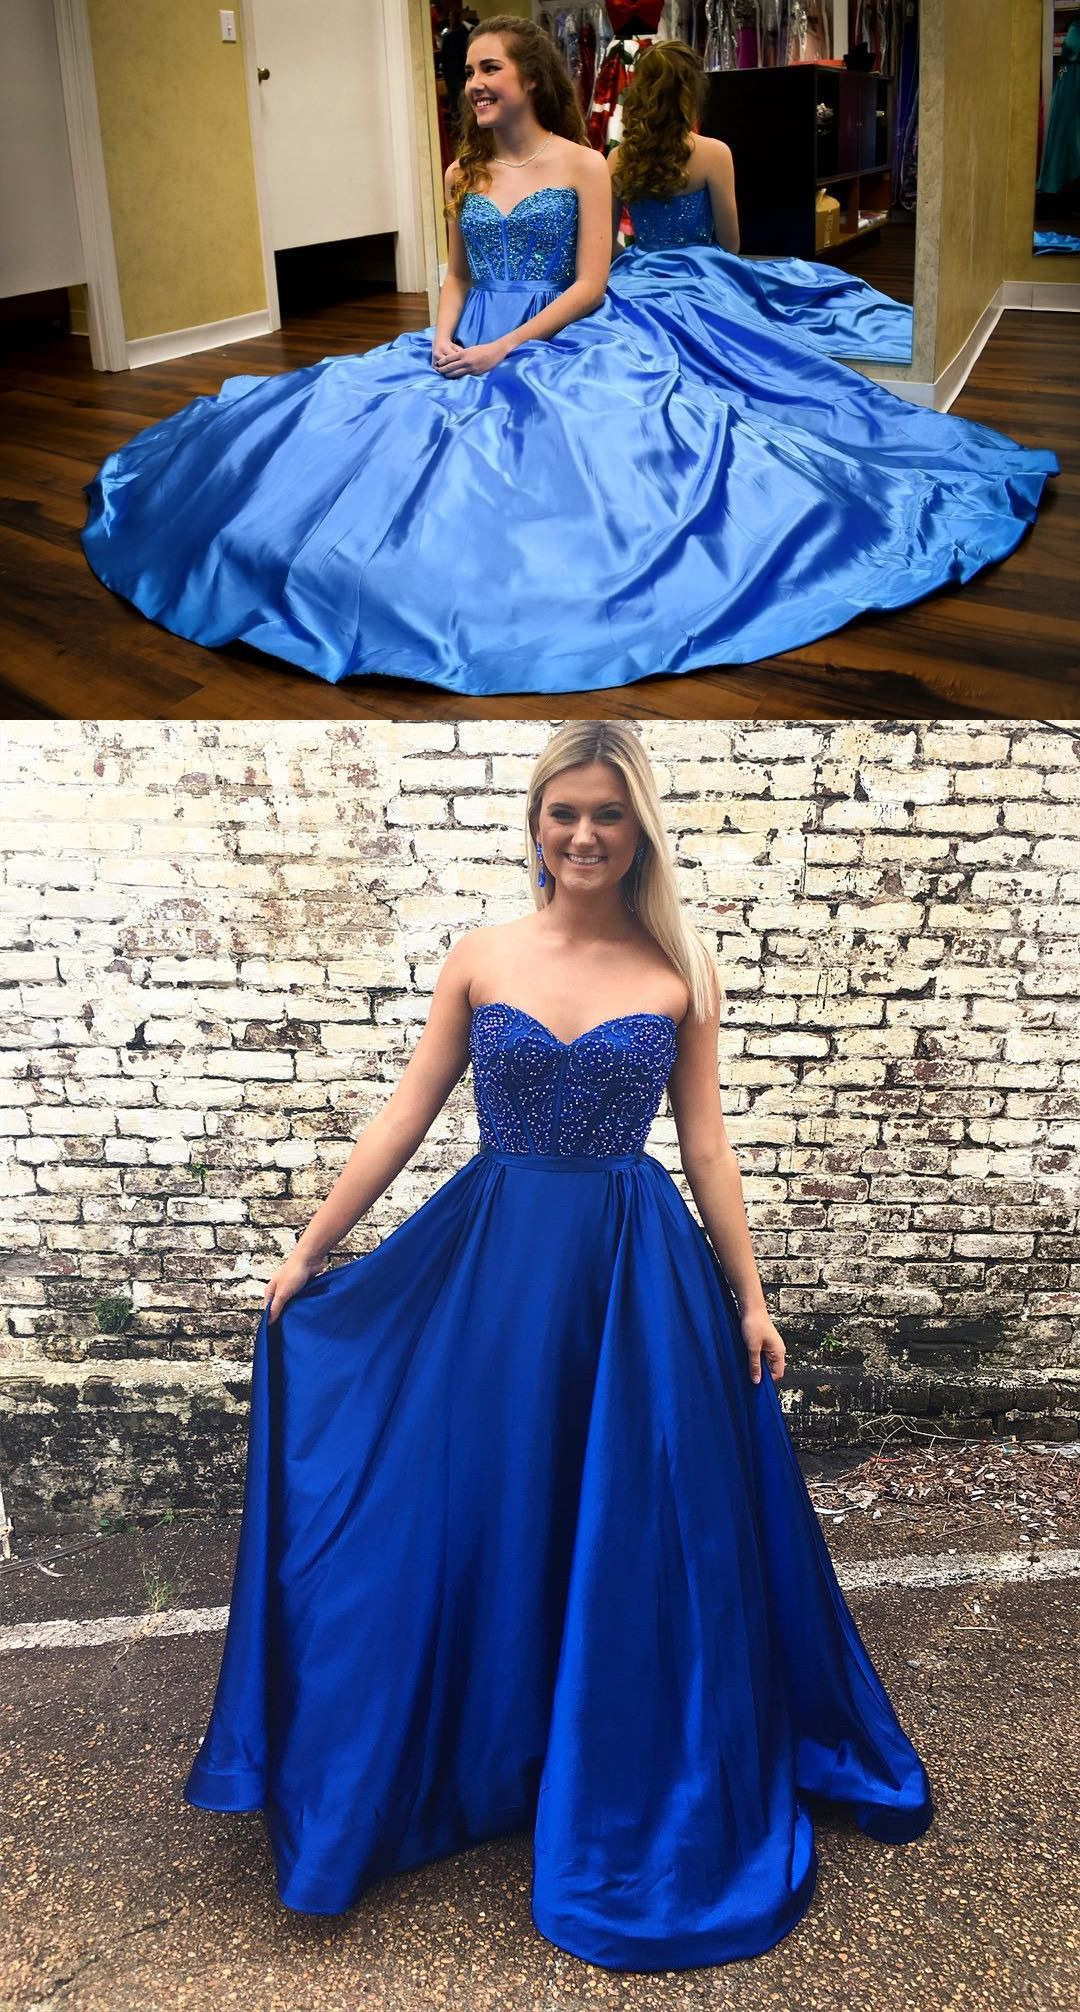 Sweetheart beads royal blue long prom dress from modsele fashion